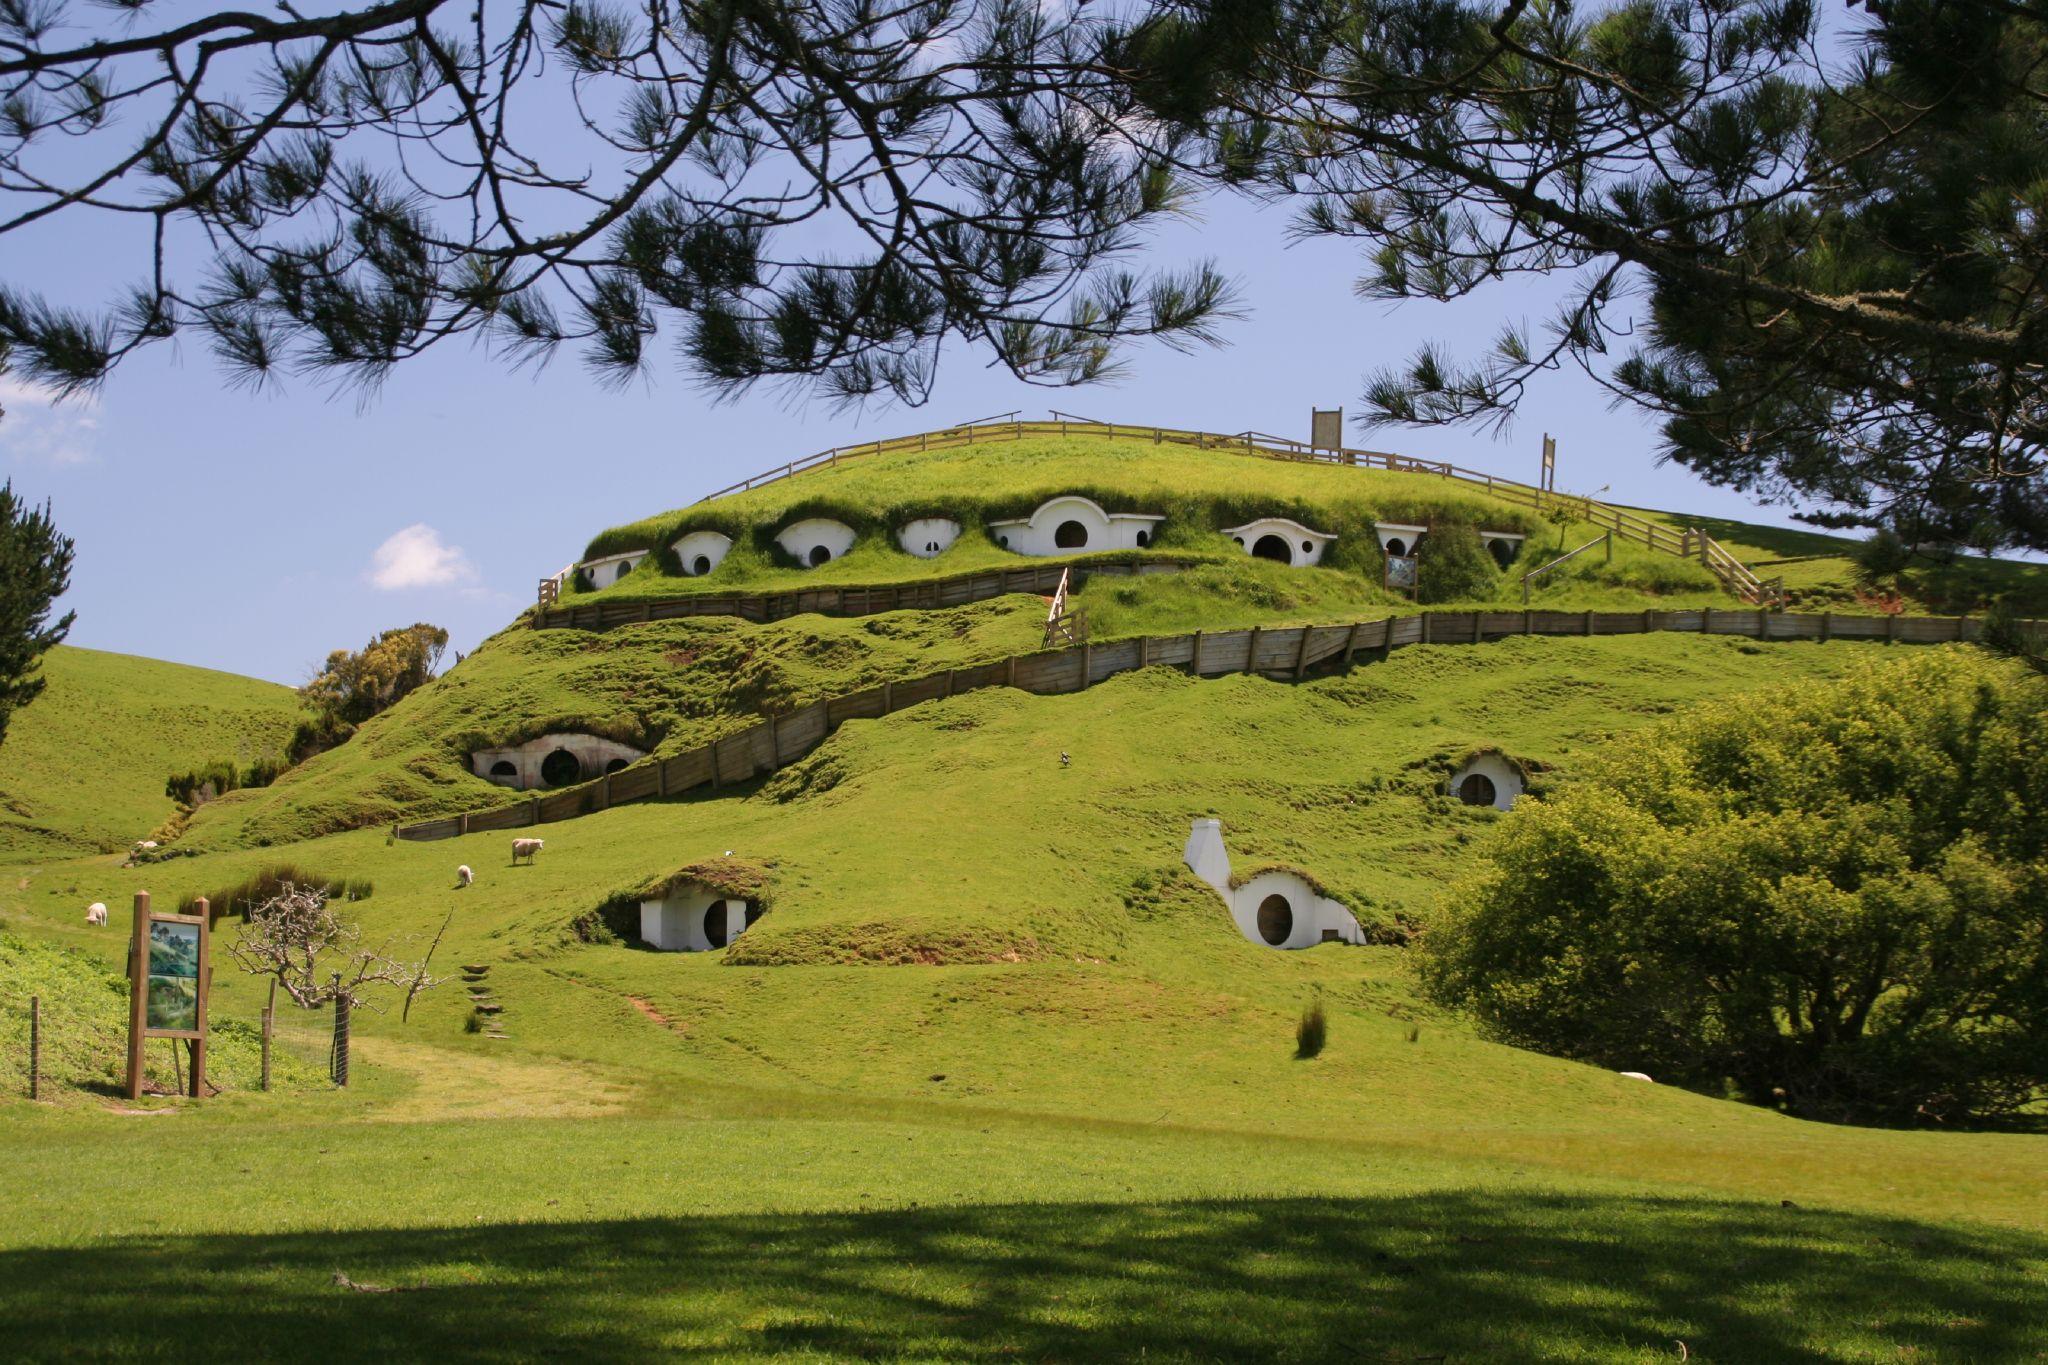 hobbit-koyu-yeni-zelanda